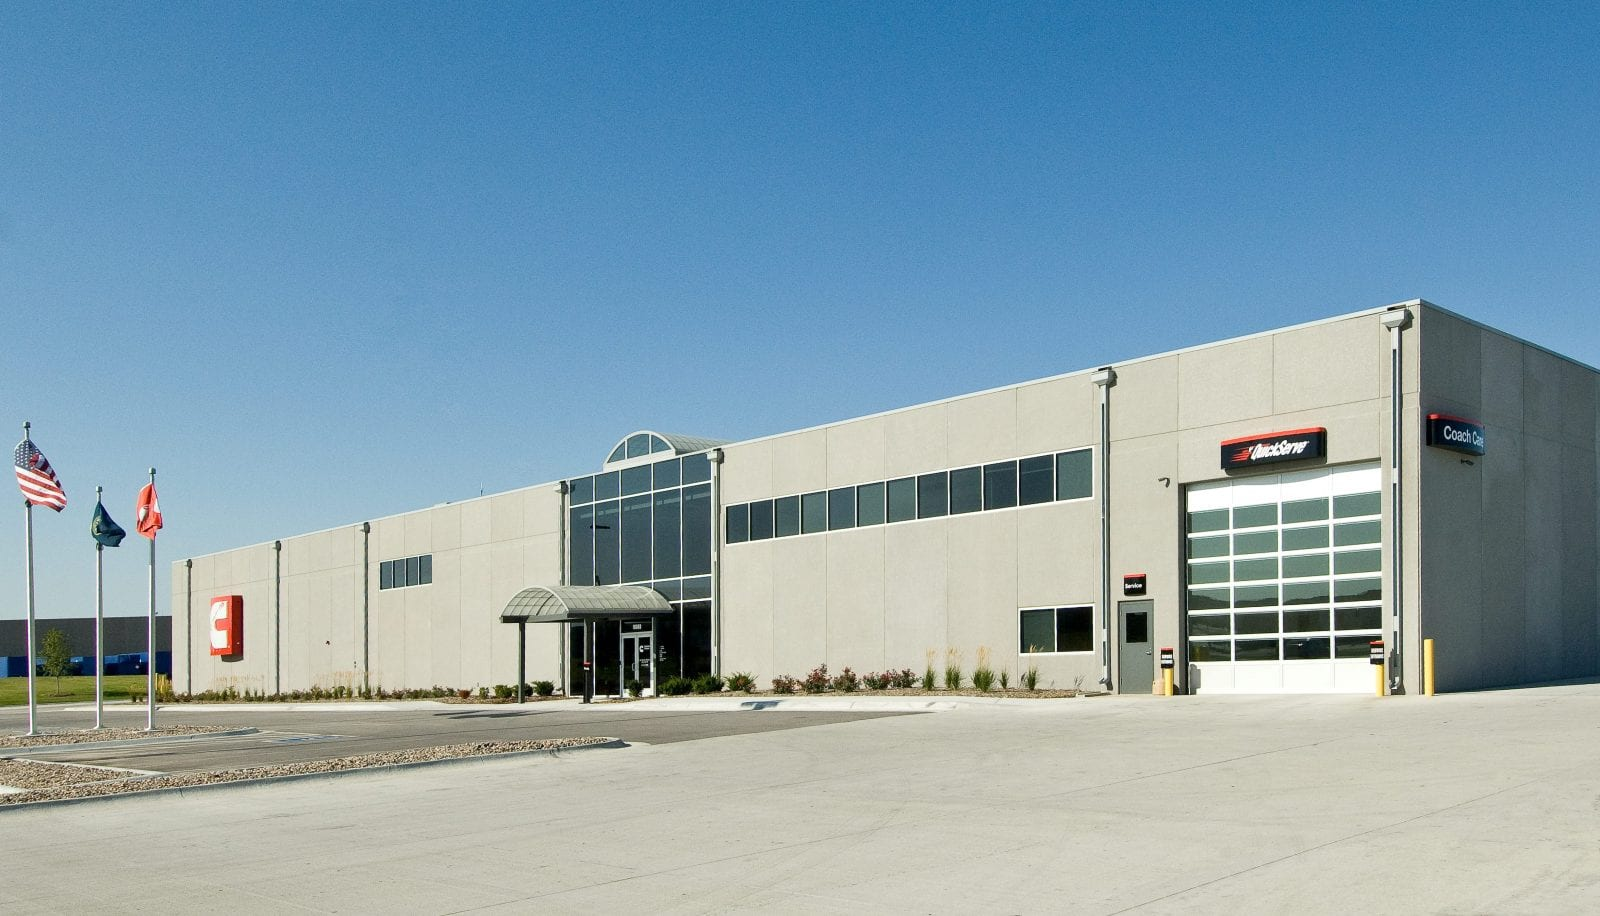 Cummins Central Power Omaha Headquarters | Schemmer